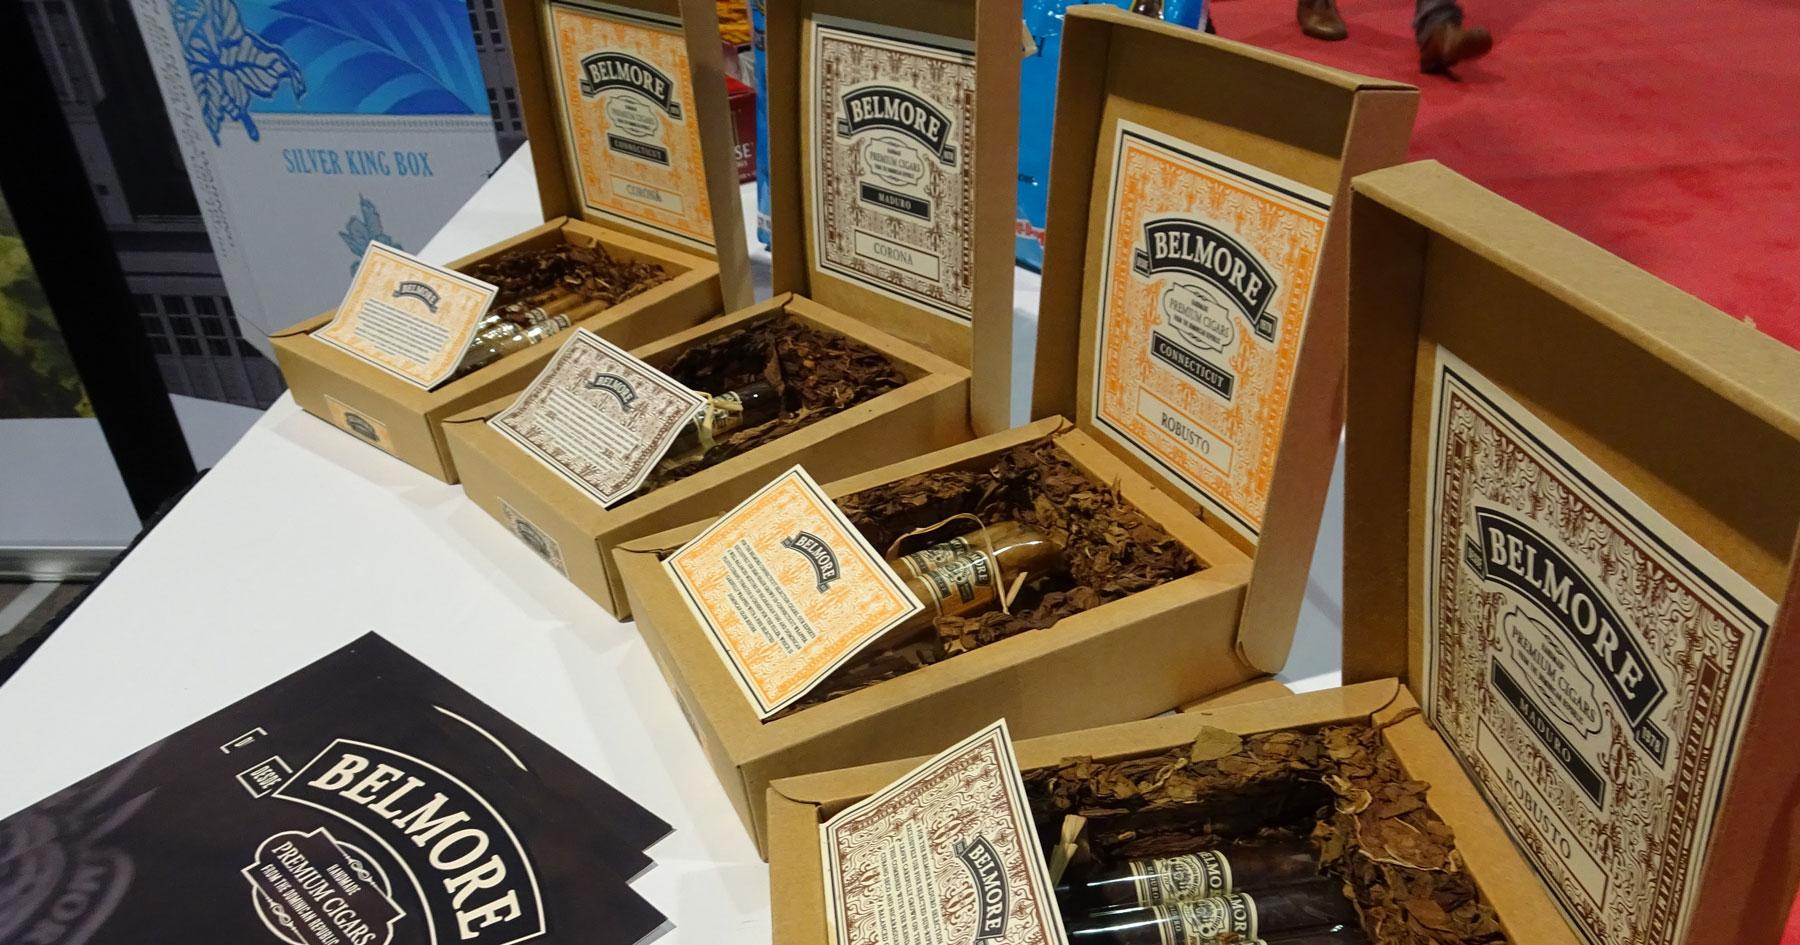 premier manufacturing belmore cigars